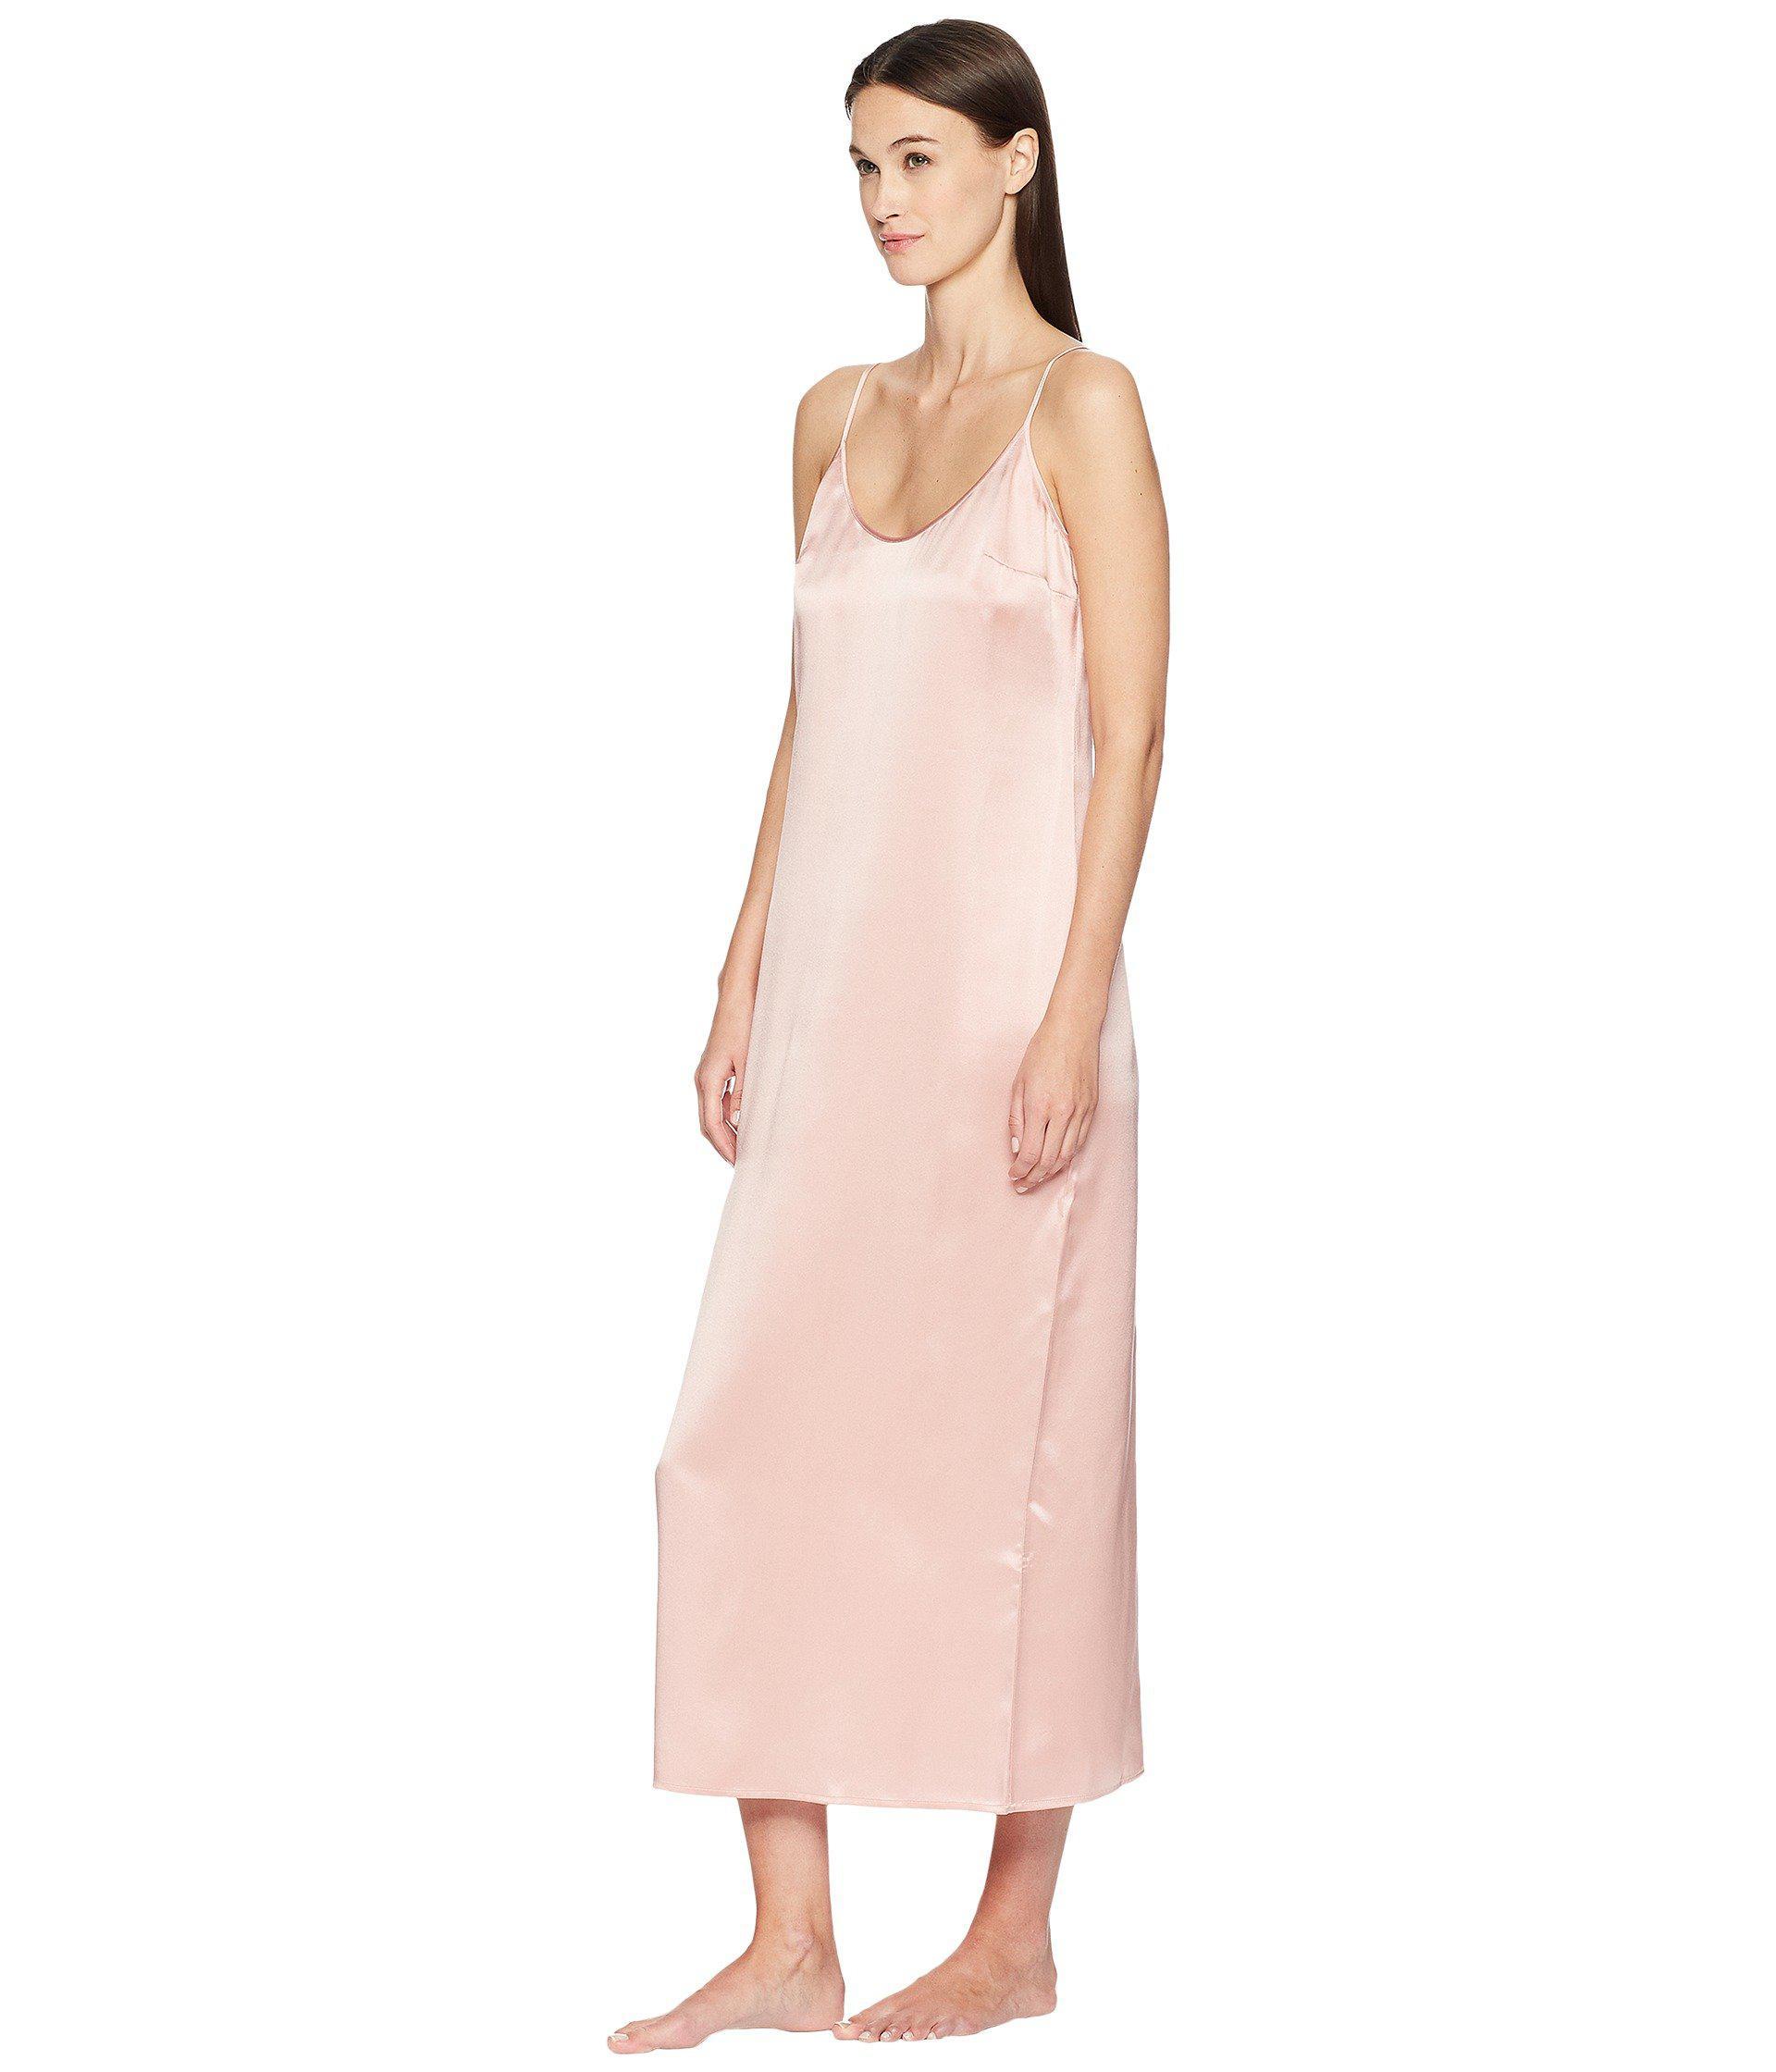 7ef9058055 Lyst - La Perla Topaz Babydoll (pink Powder) Women s Pajama in Pink